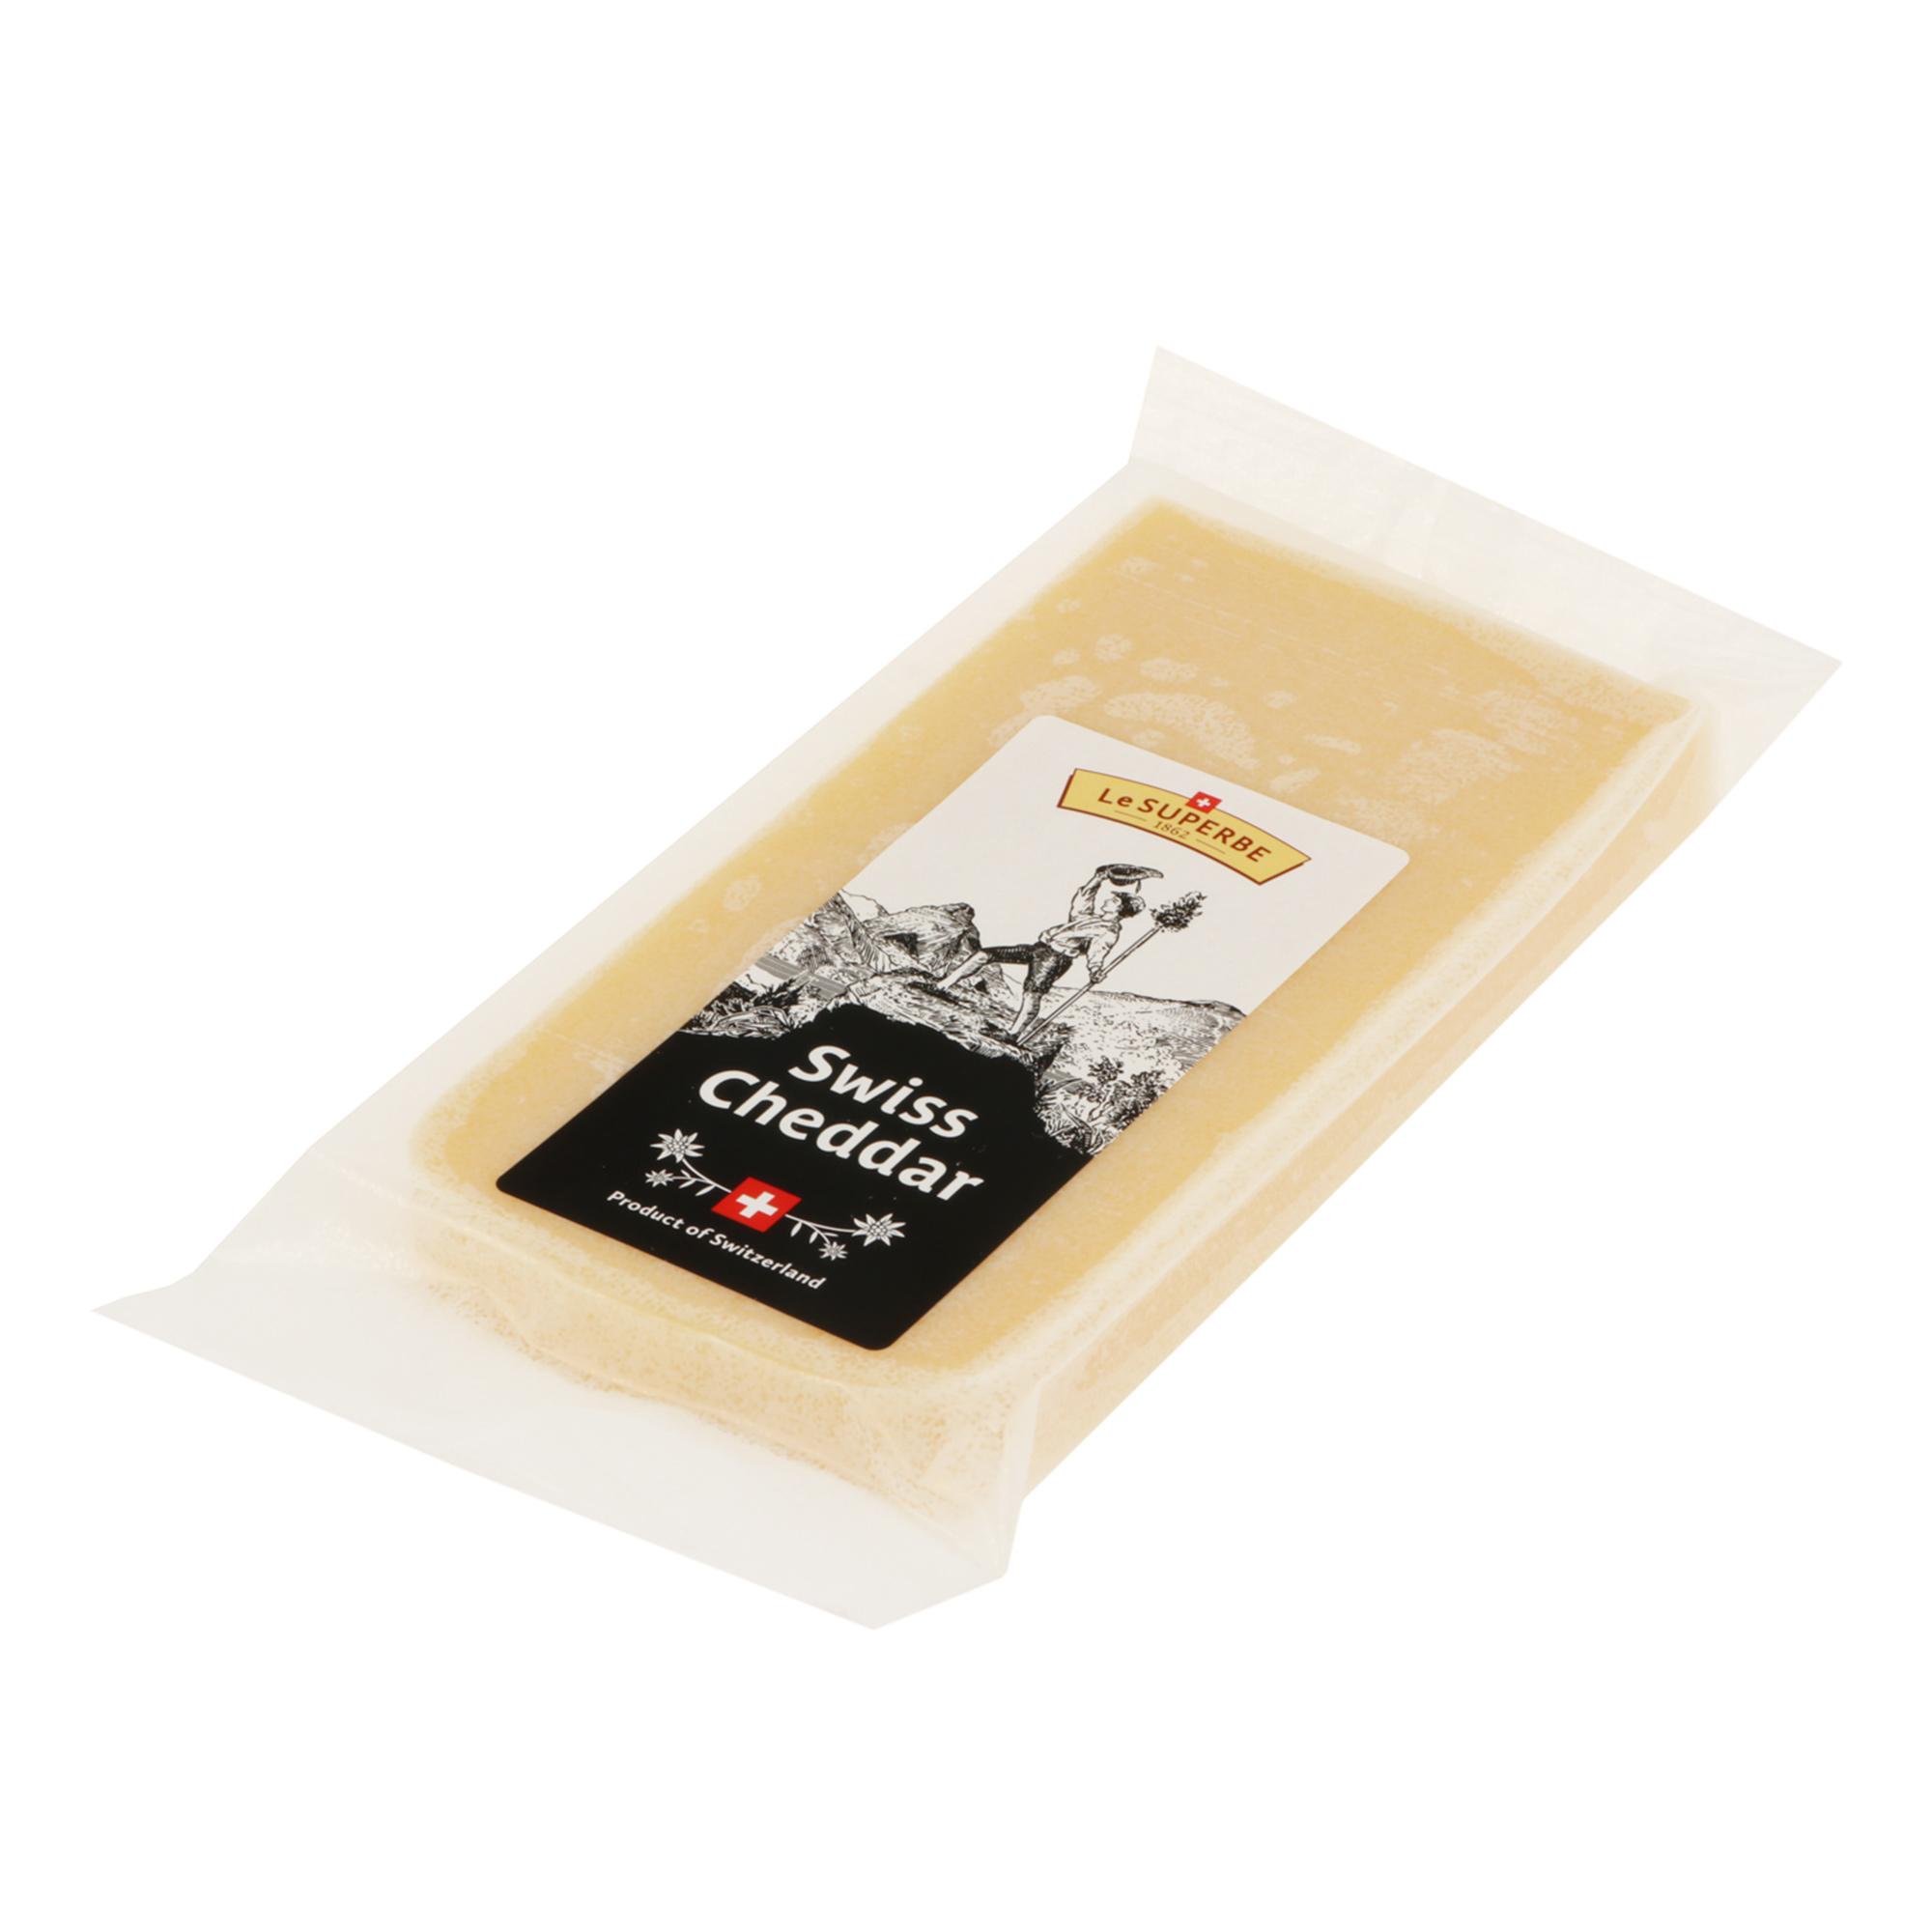 Фото - Сыр твердый Le SUPERBE Чеддер 200 г сыр твердый кабош чеддер красный 49% 200 г